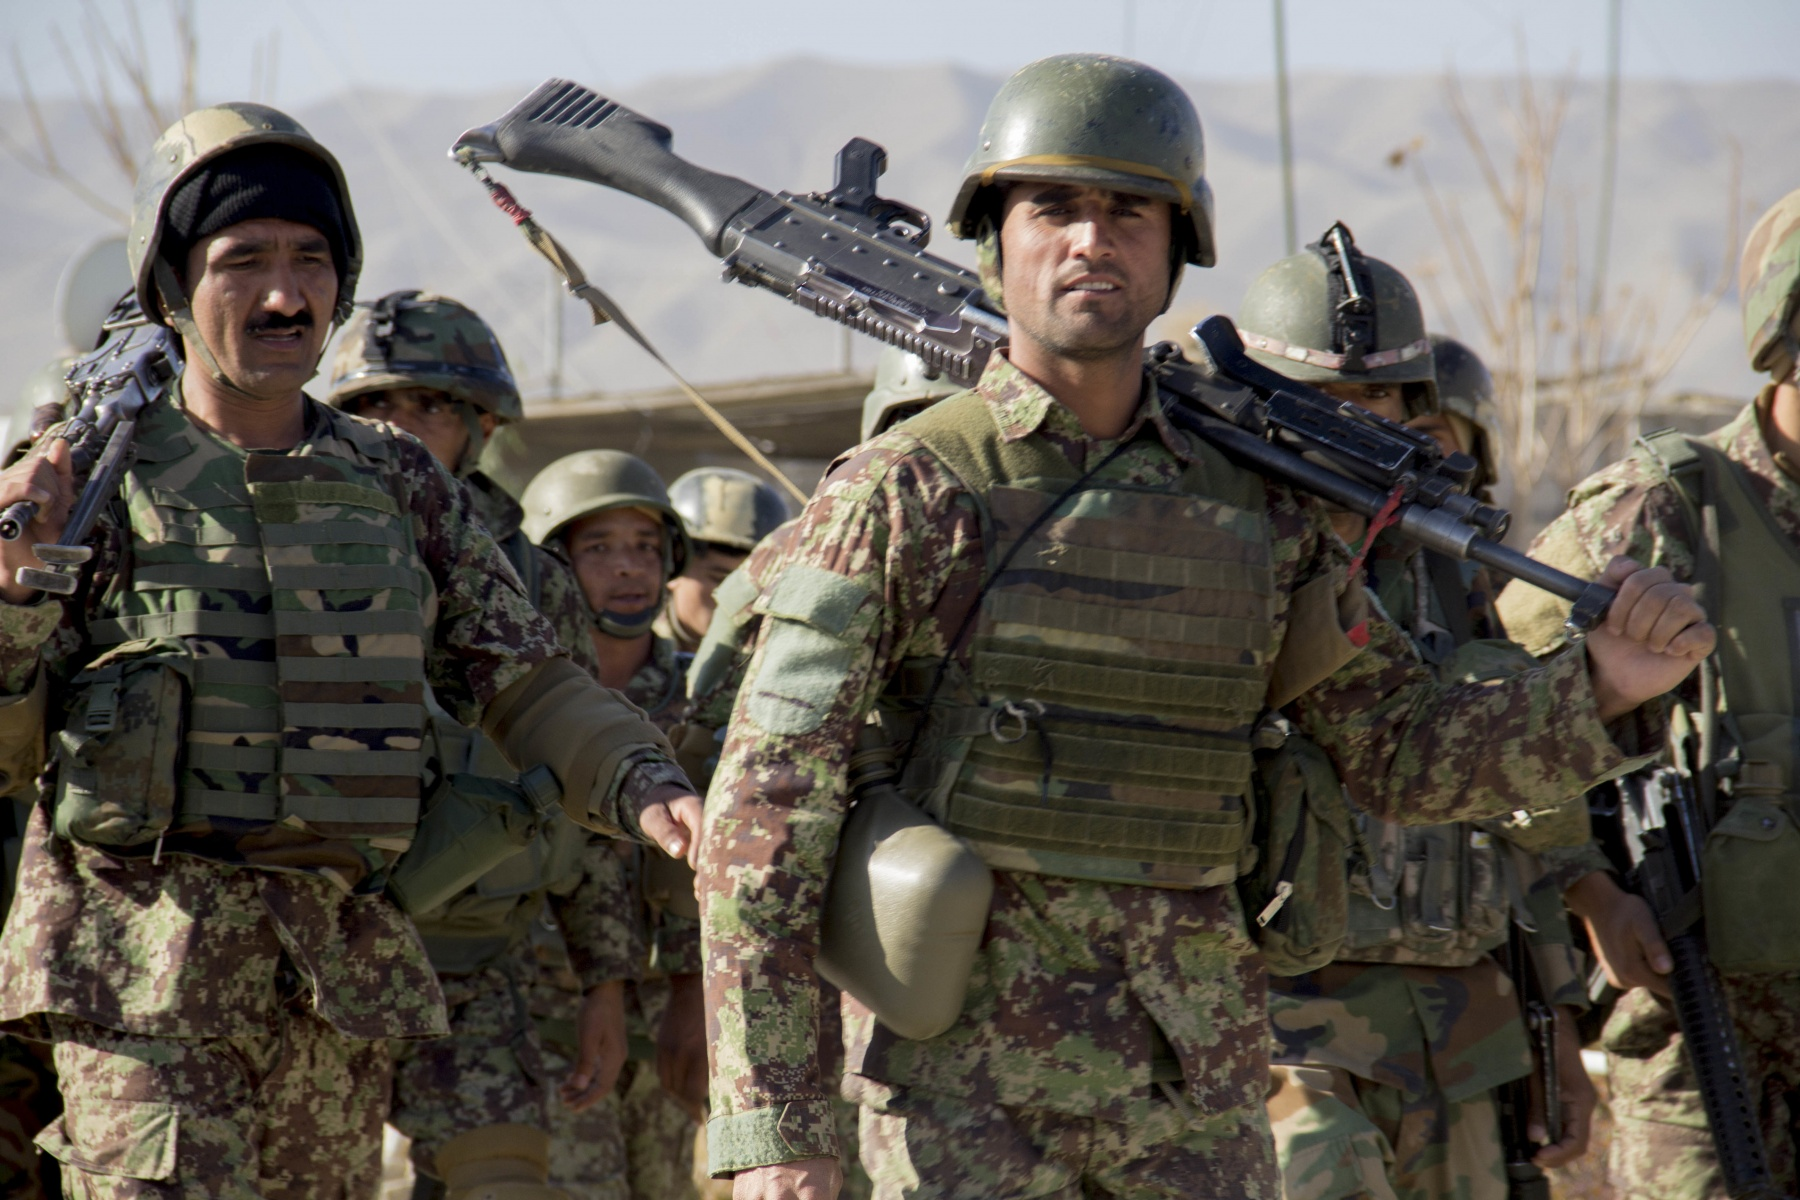 Rakkasans' Afghanistan Deployment Could Be Blueprint For